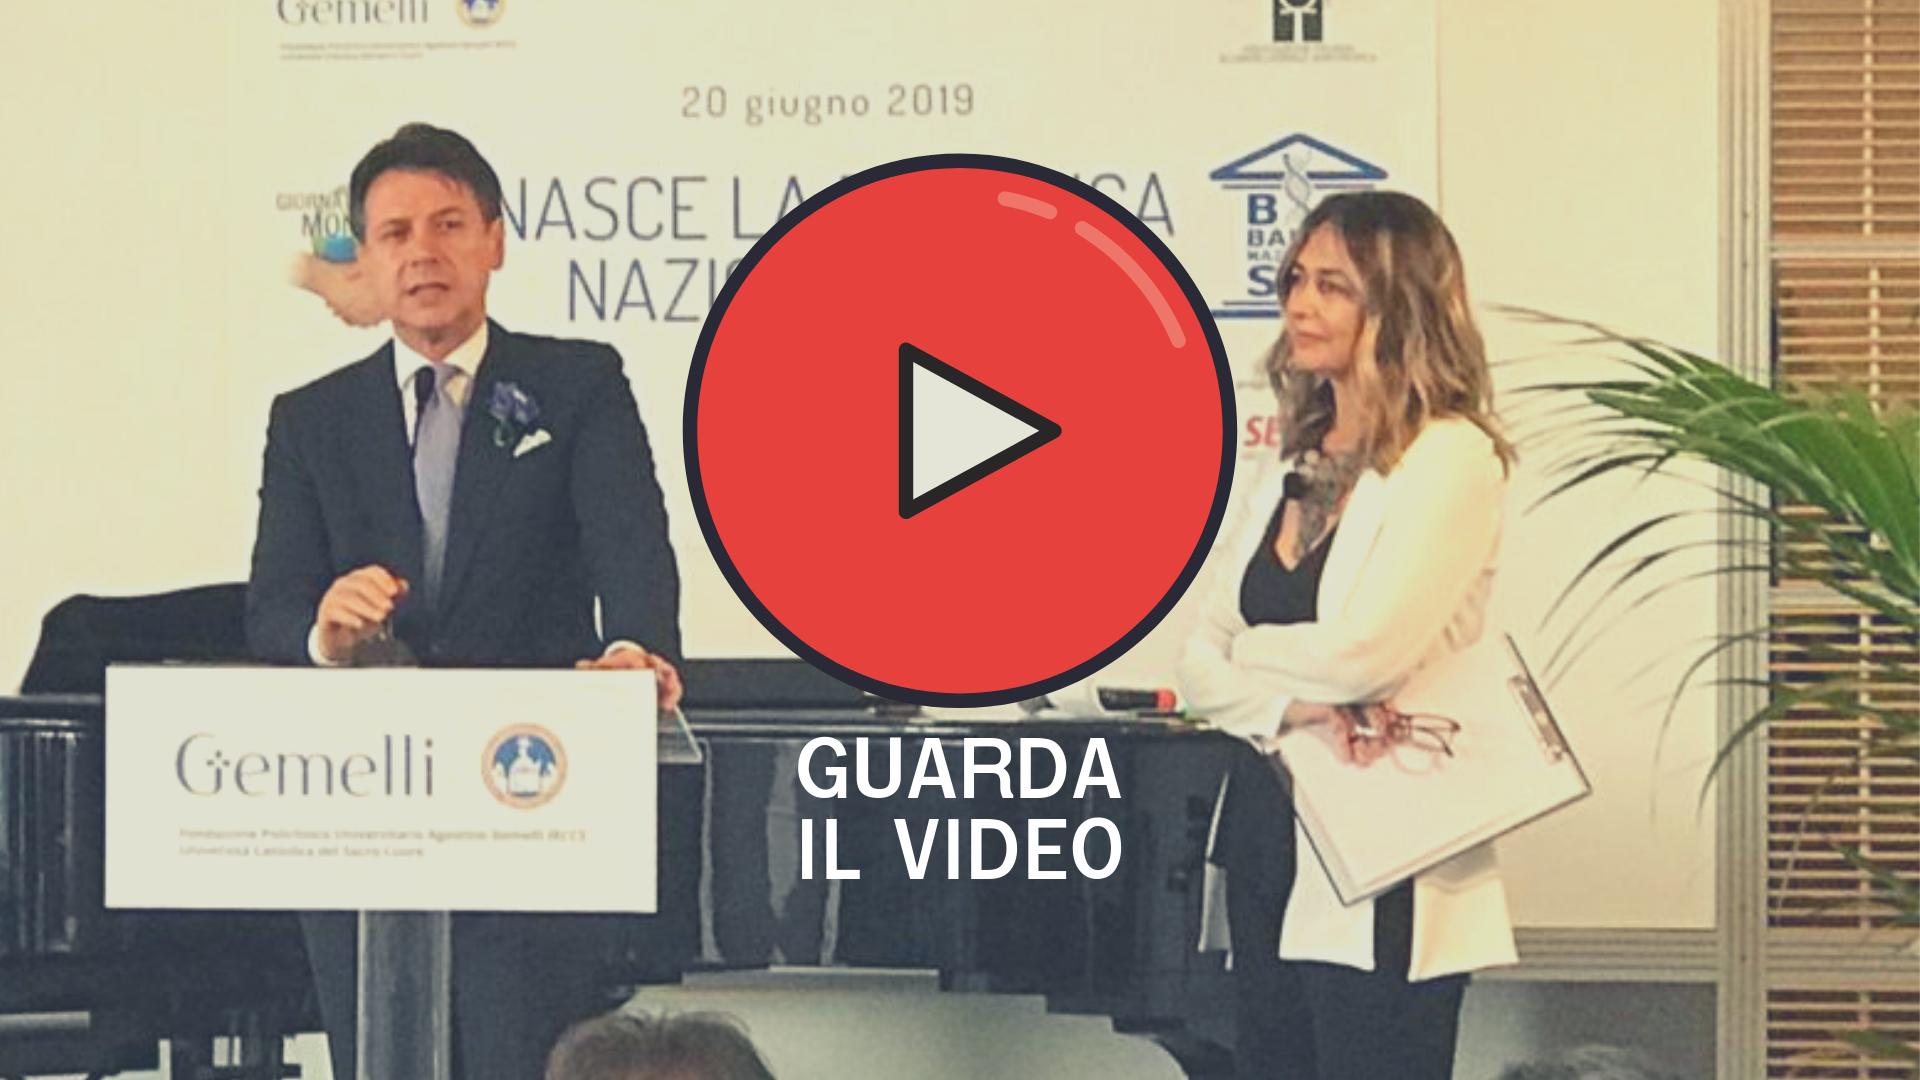 Giuseppe Conte Presidente Consiglio Sla Global Day NeMO Roma Biobanca Arisla onlus